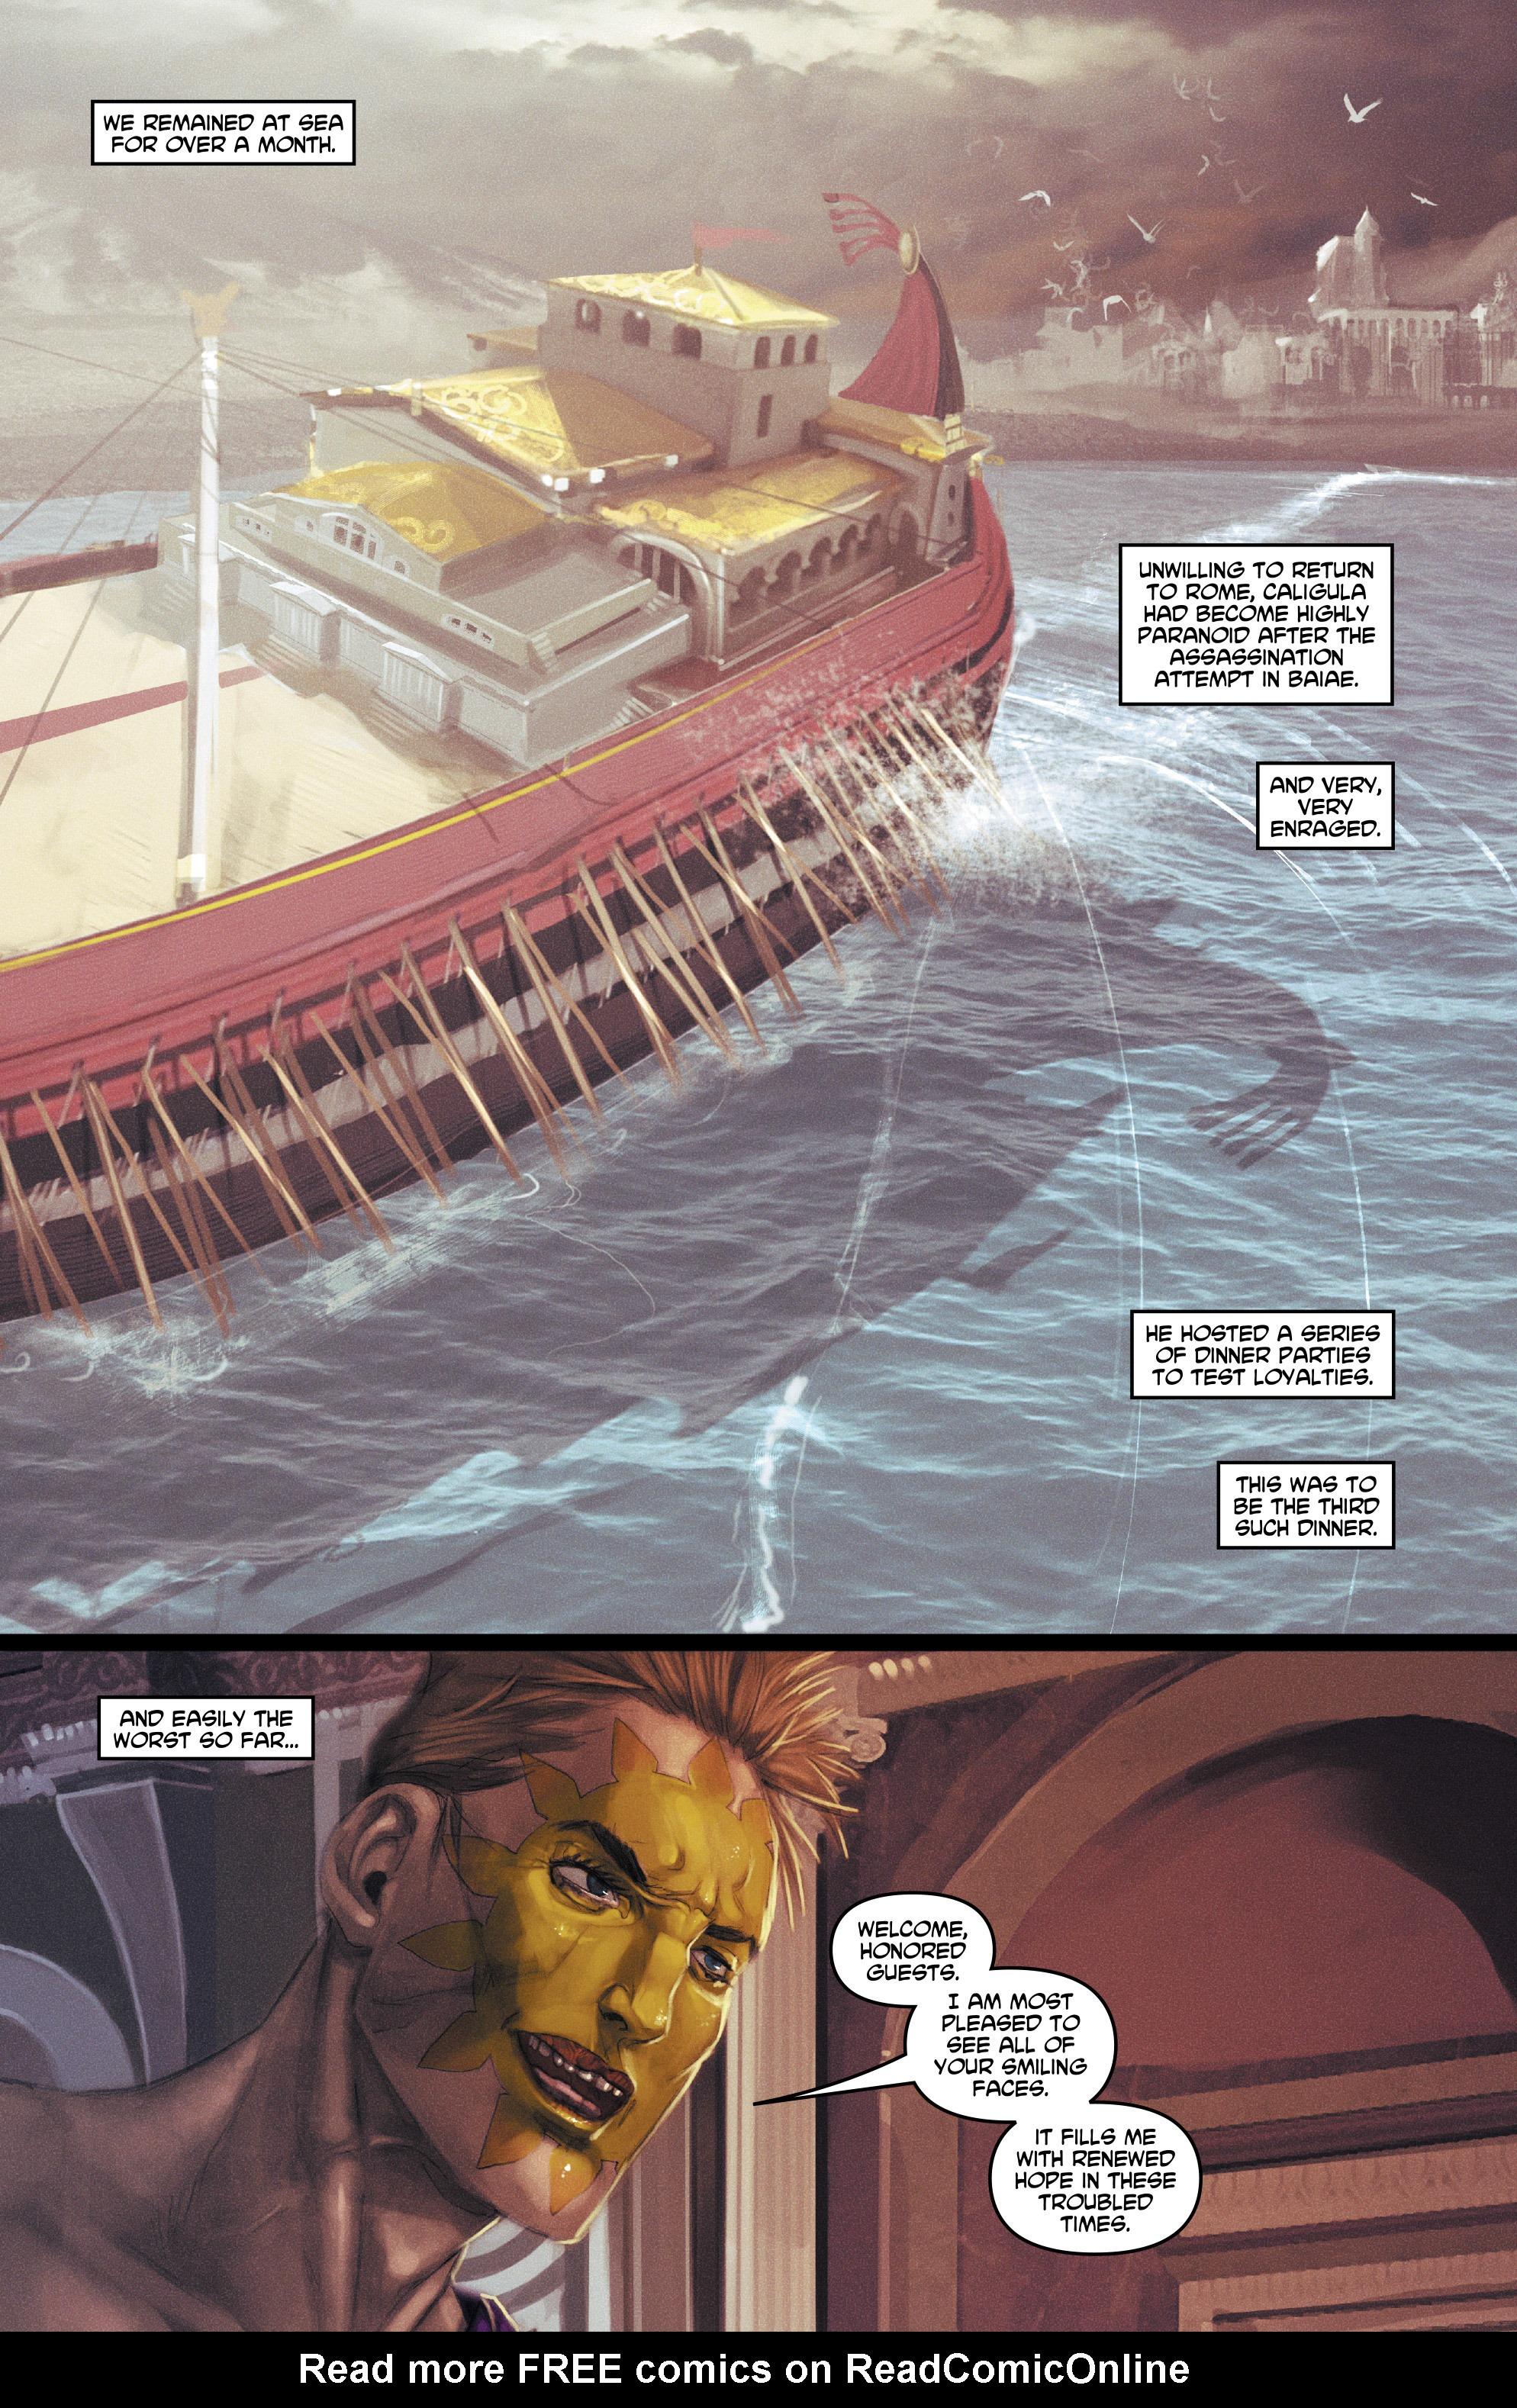 Caligula Issue 3   Read Caligula Issue 3 comic online in